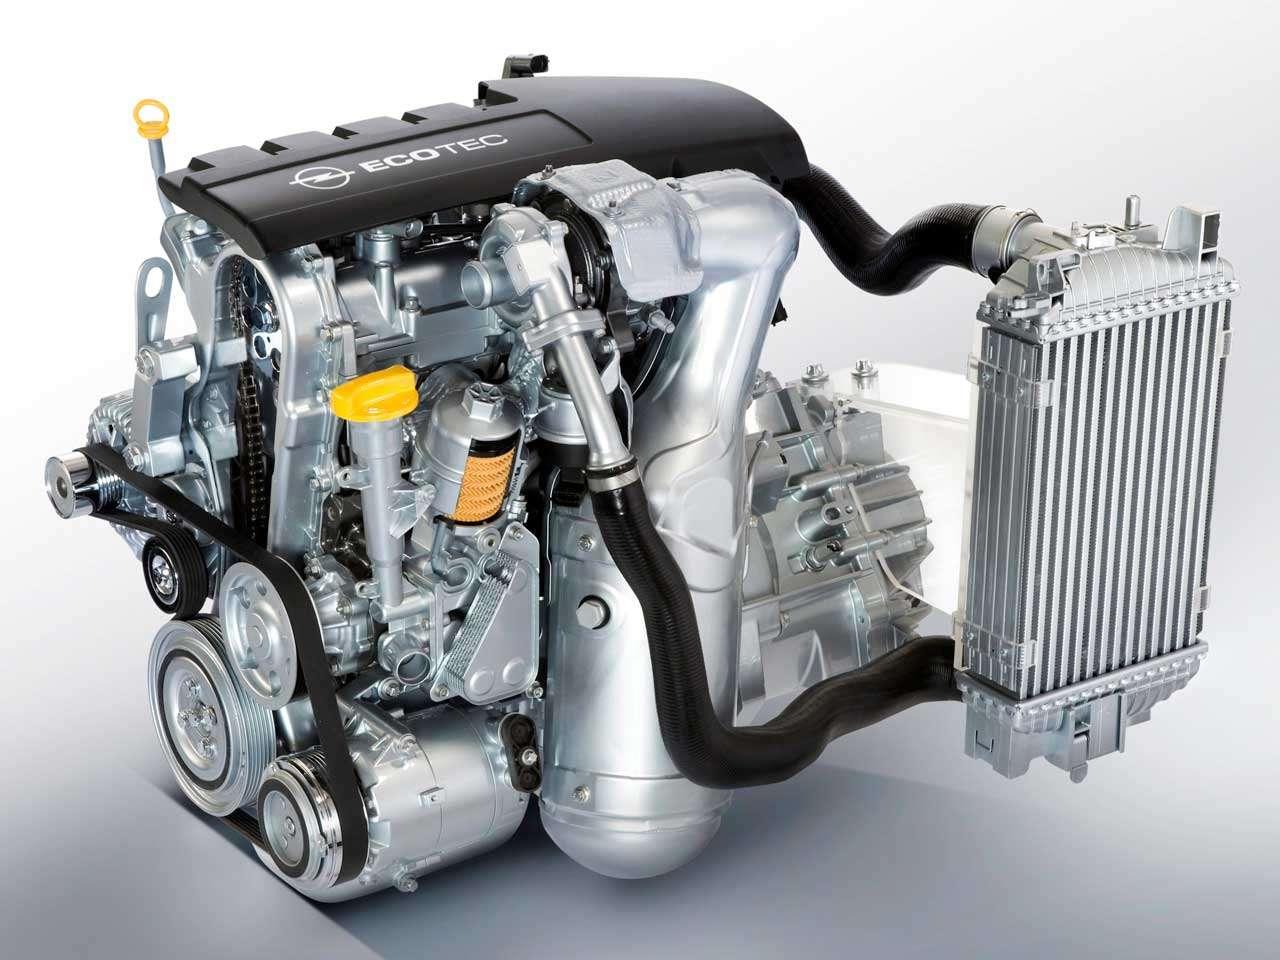 Фото двигателя минивэна